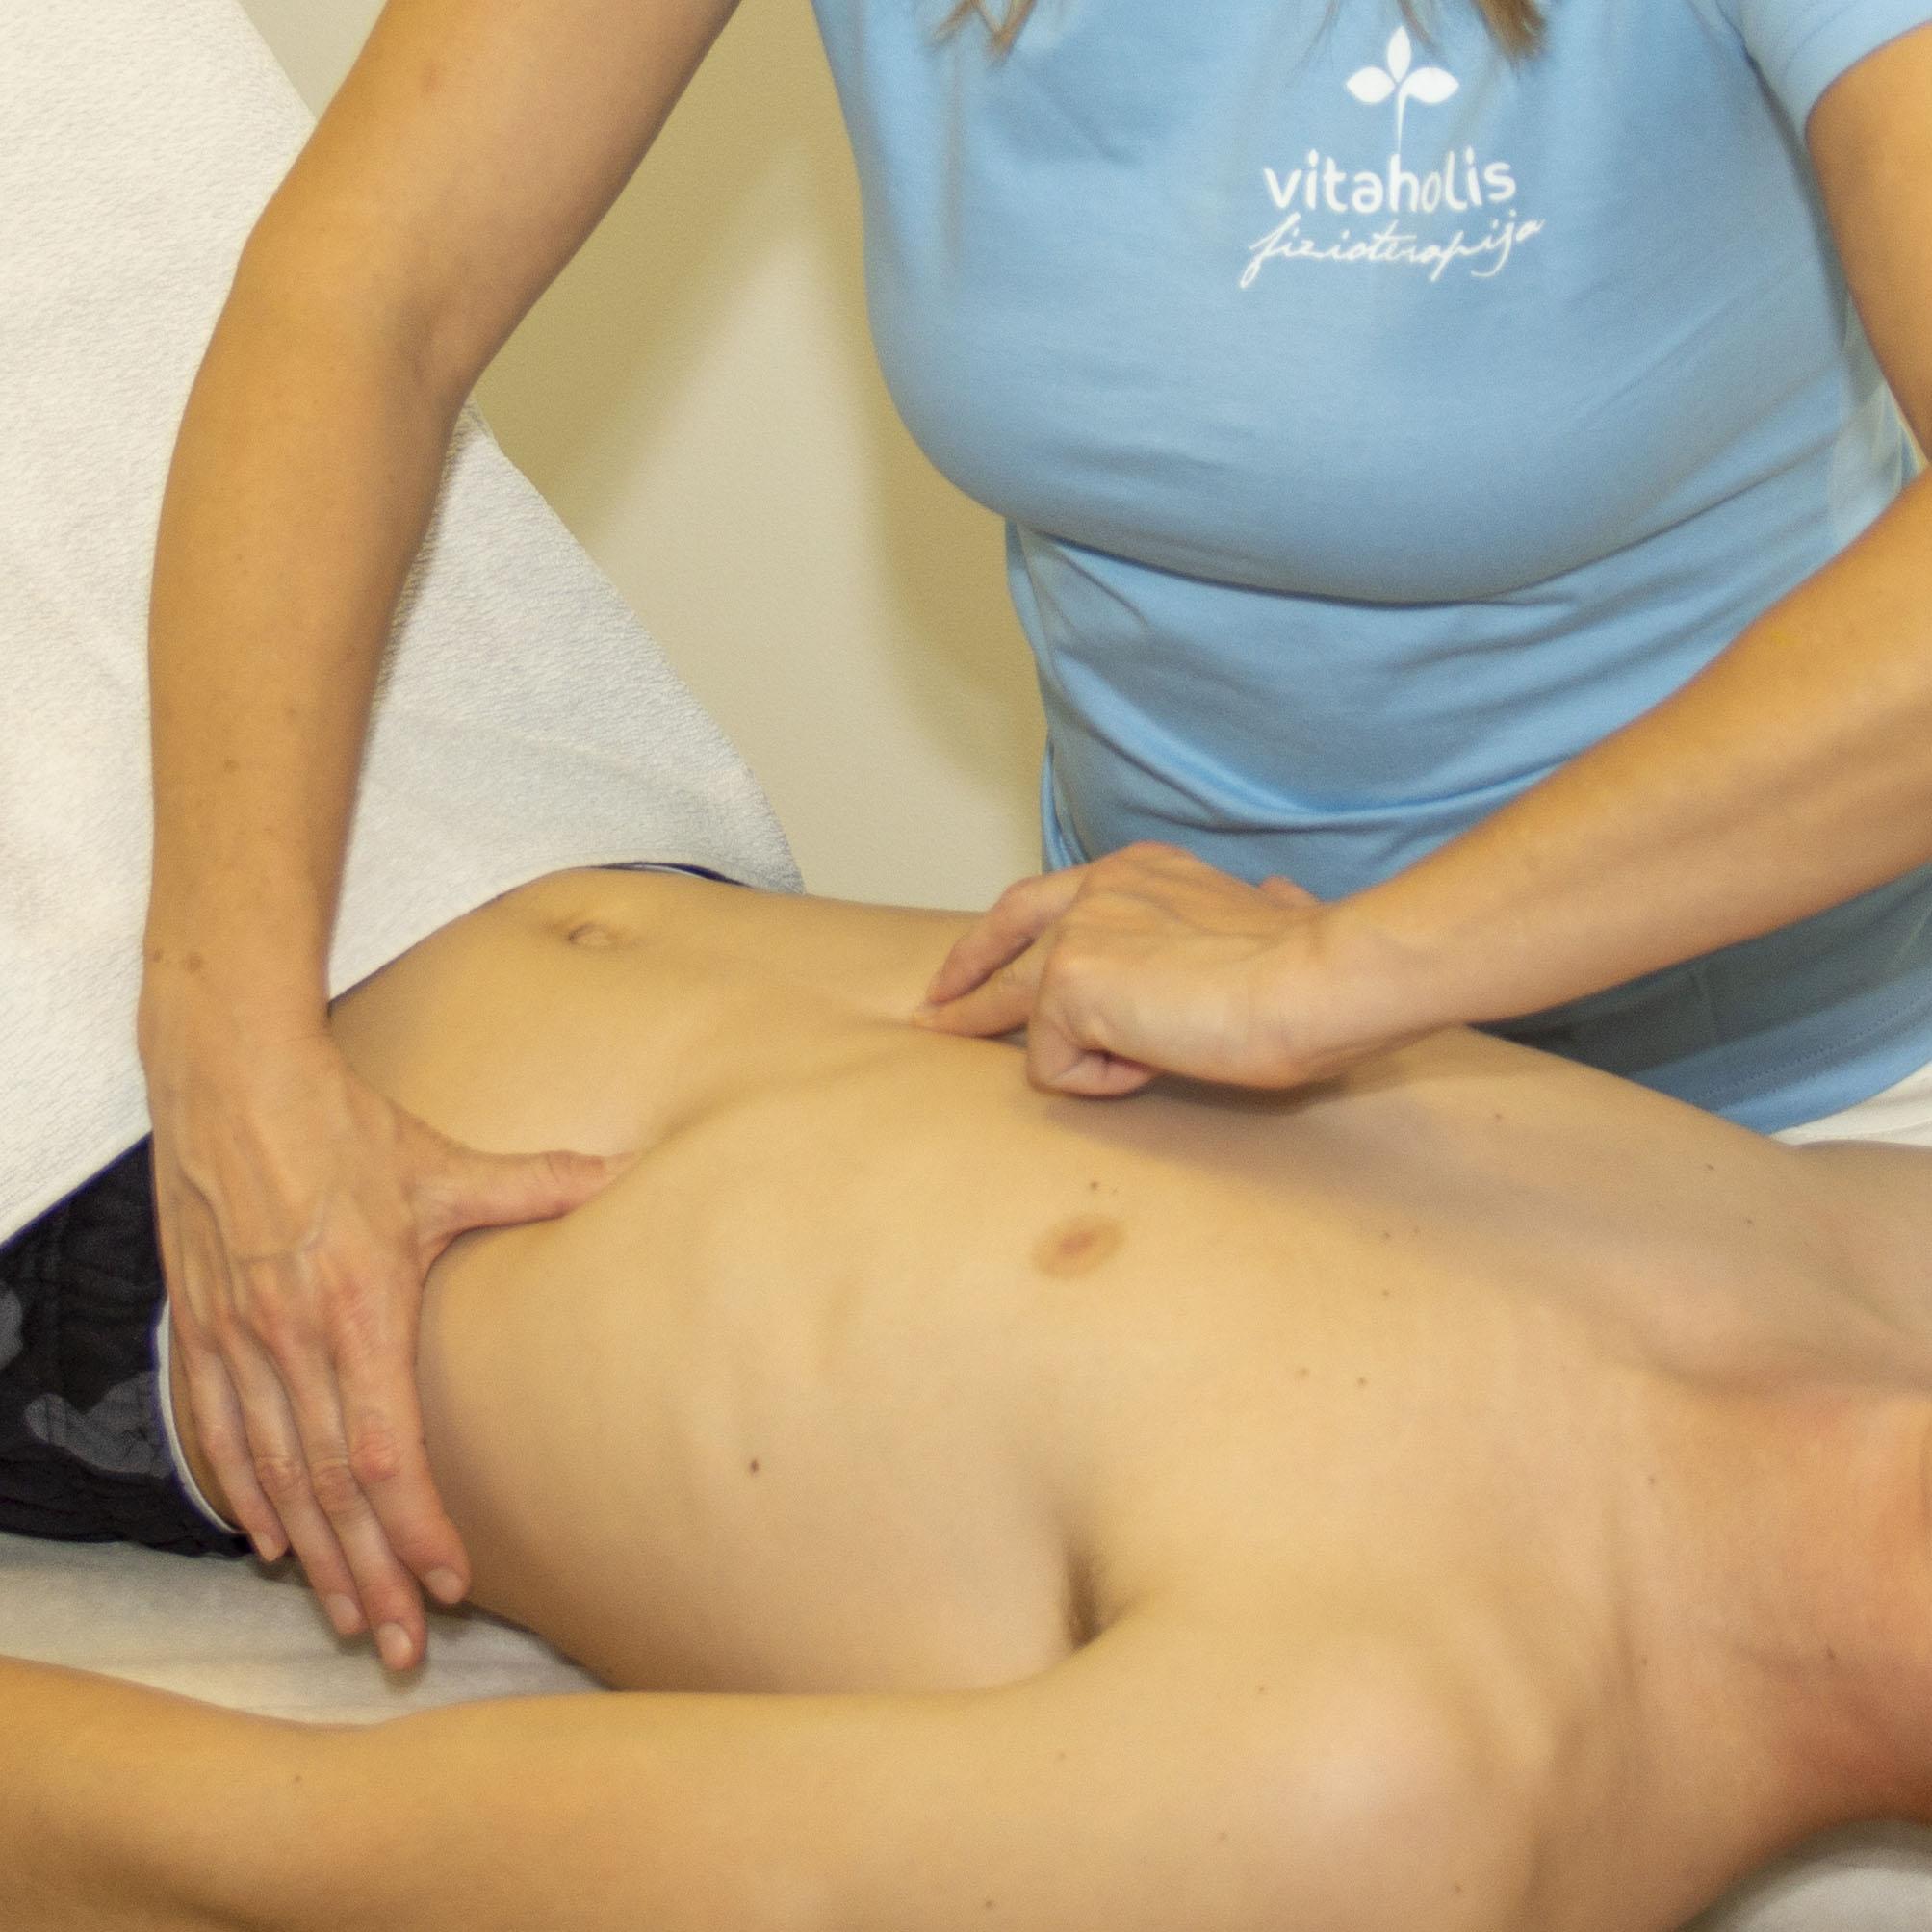 Fizioterapija Vitaholis Bownova terapija